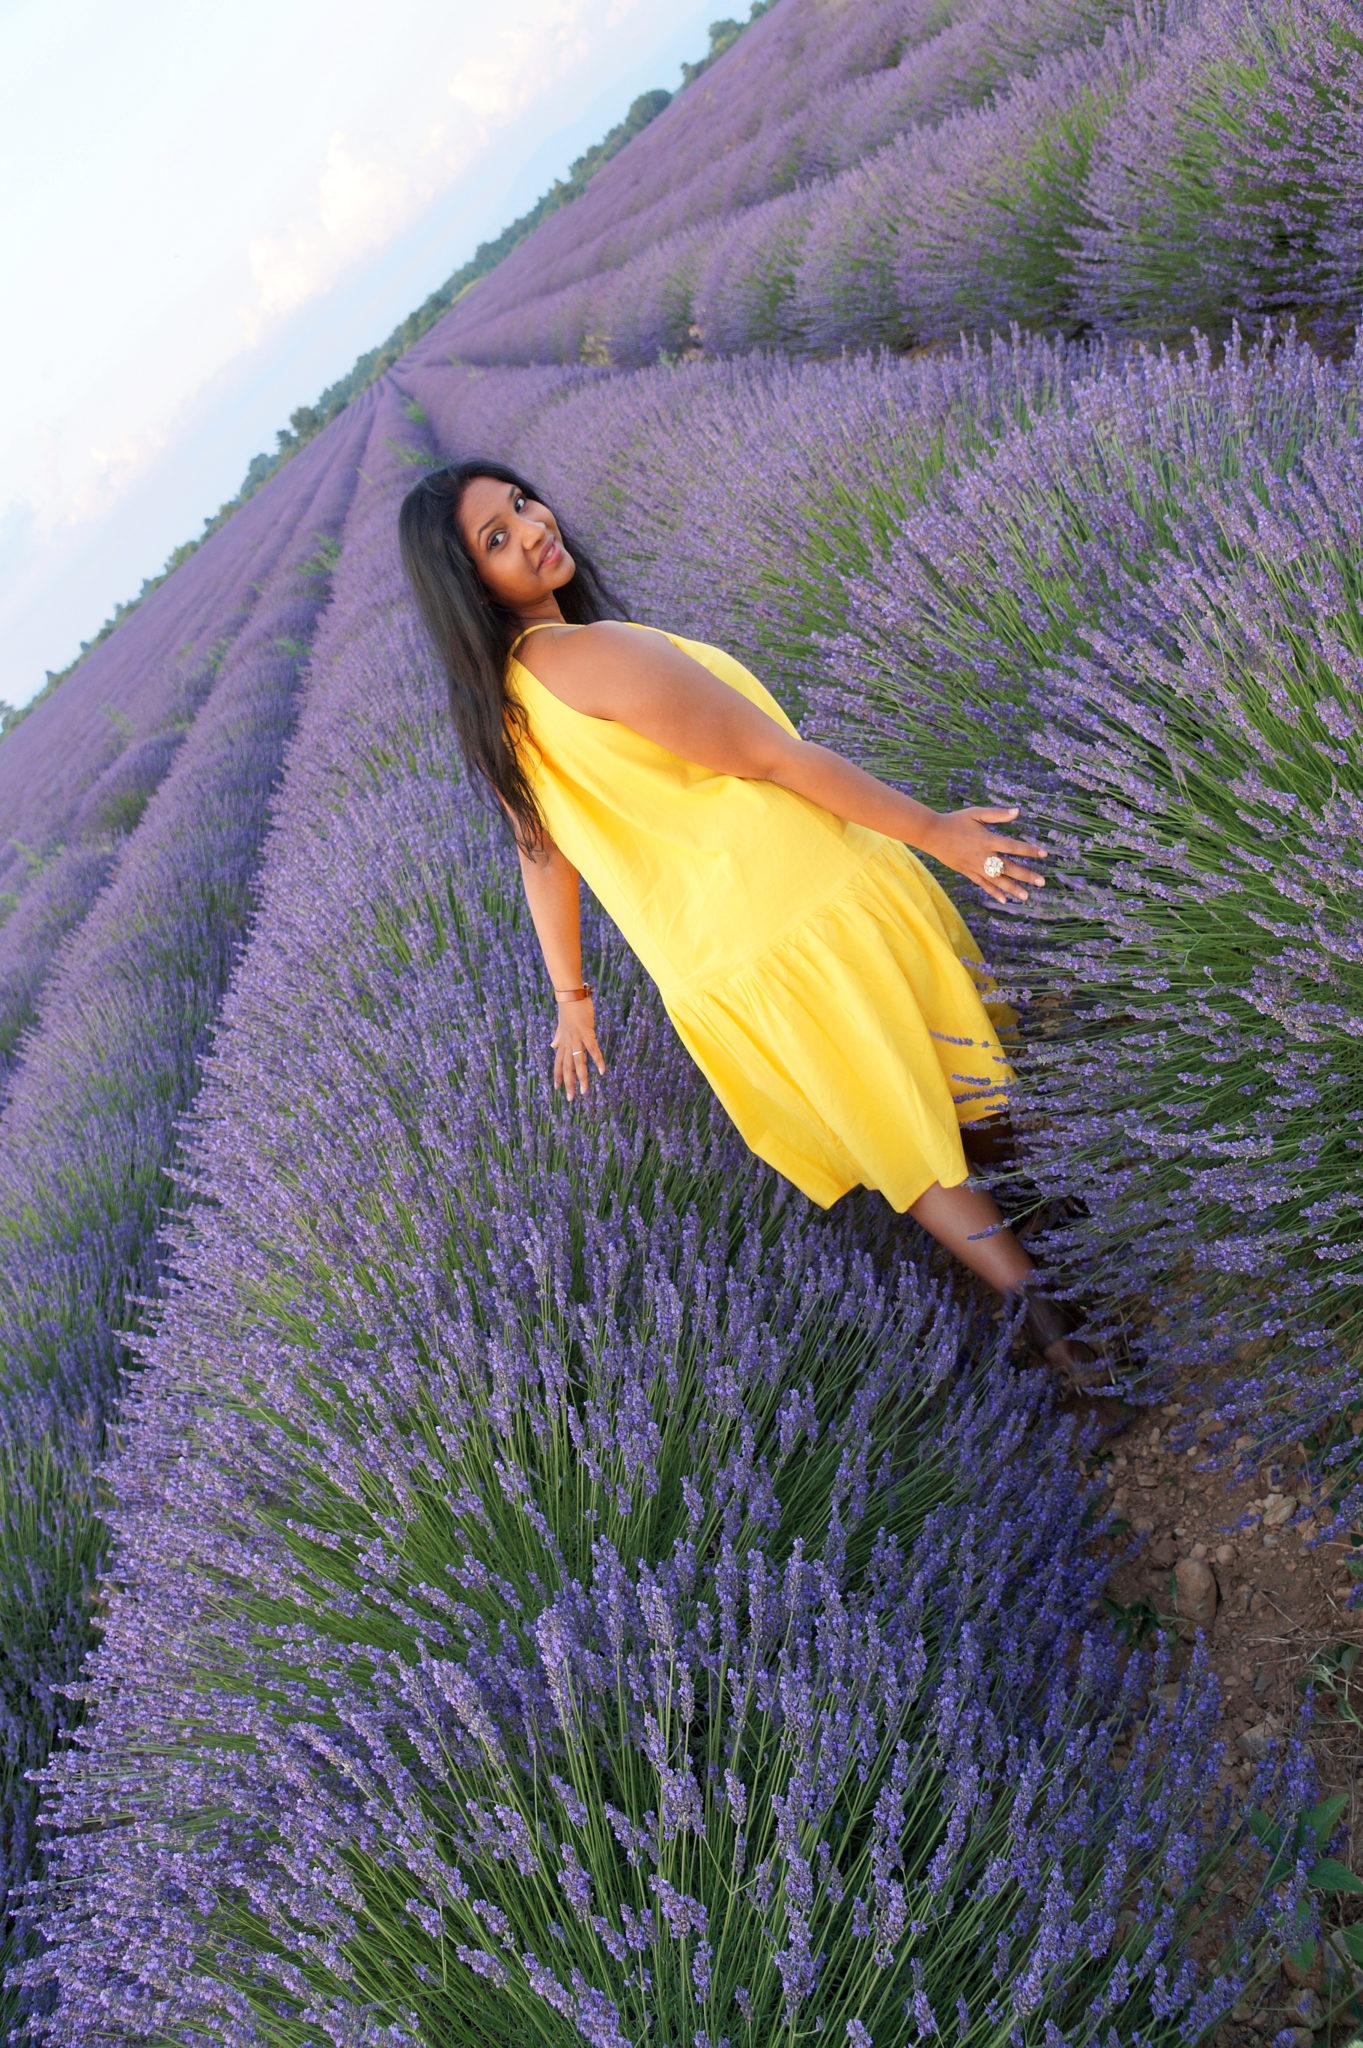 Hema_pose_ses_valises_balade_champ_lavande_valensole_or_bleu